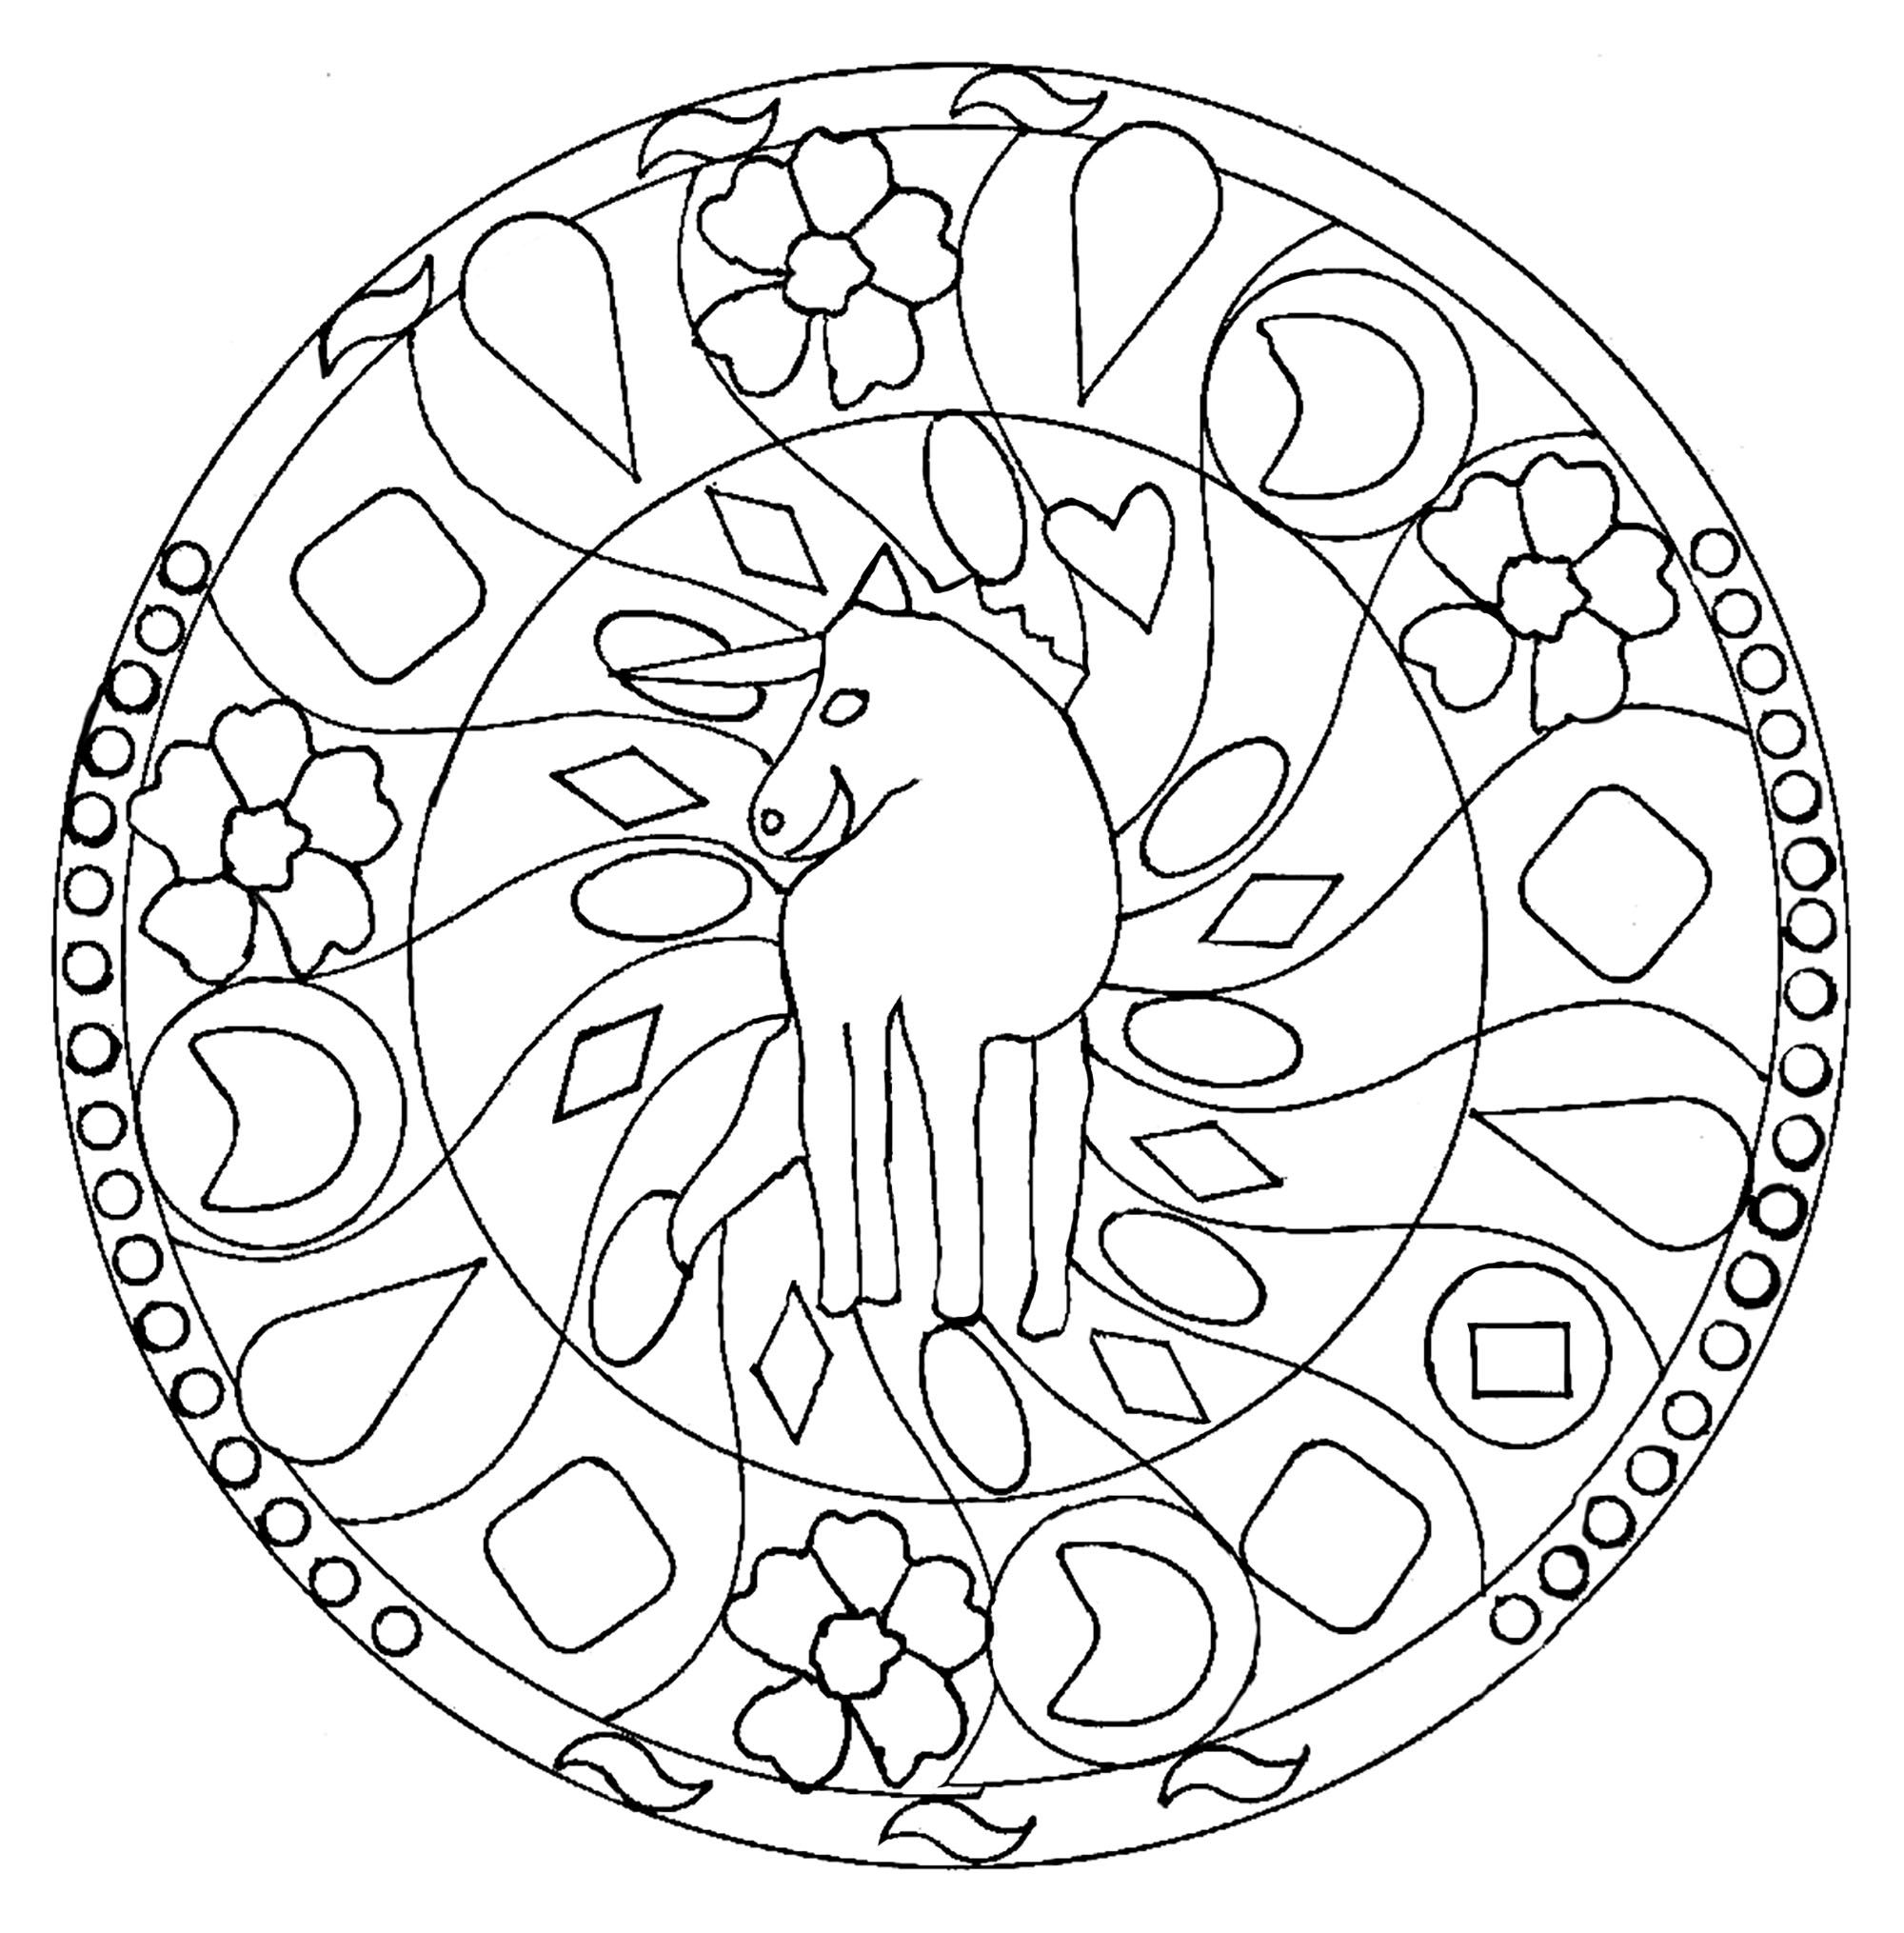 Mandala Facile Licorne Mandalas Faciles Pour Enfants 100 Mandalas Zen Anti Stress